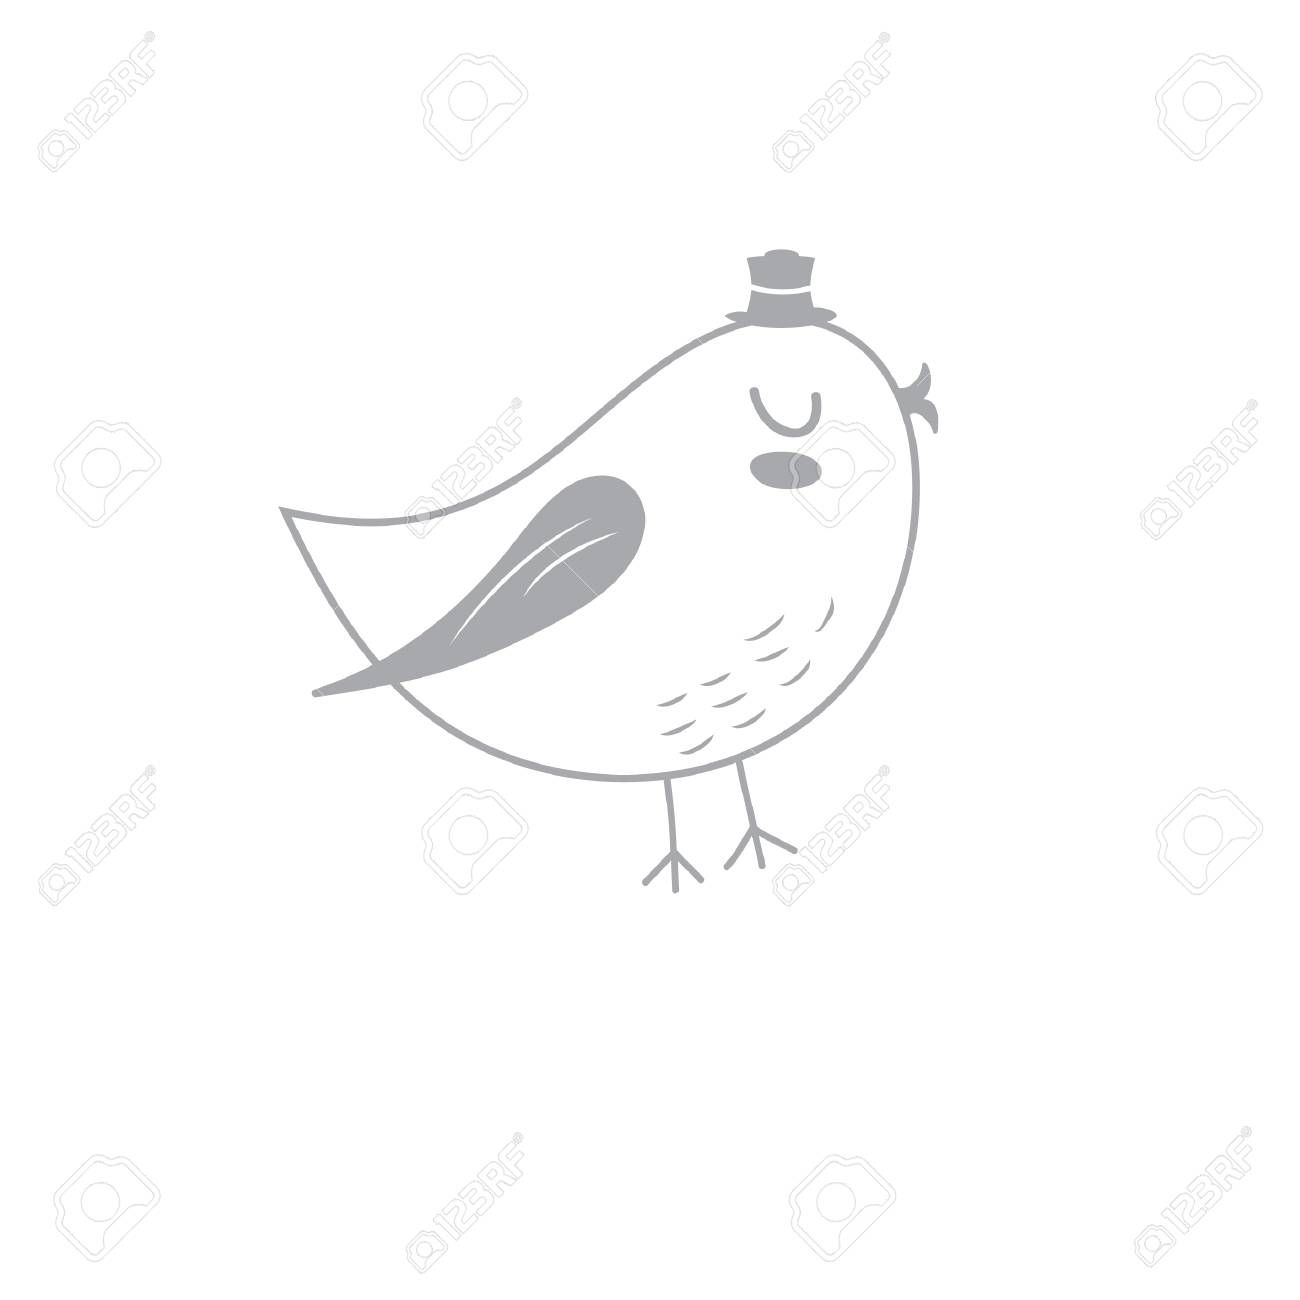 46++ Fictional birds ideas